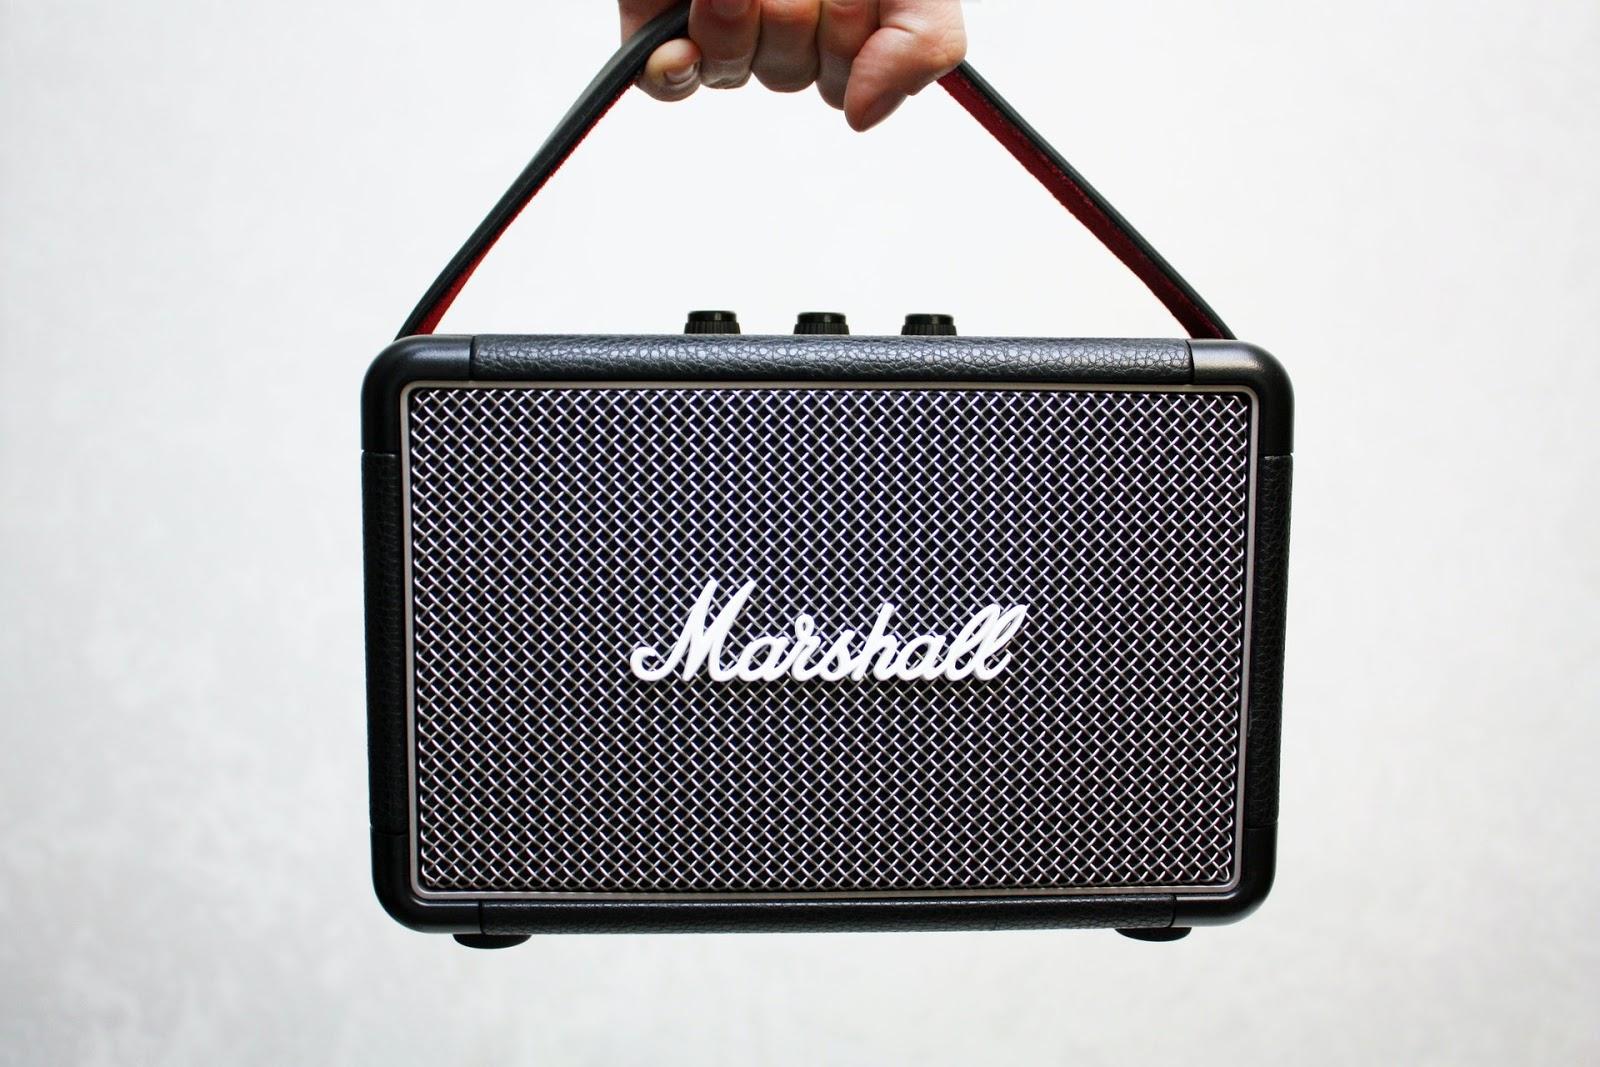 black-marshall-portable-guitar-amplifier-1706694